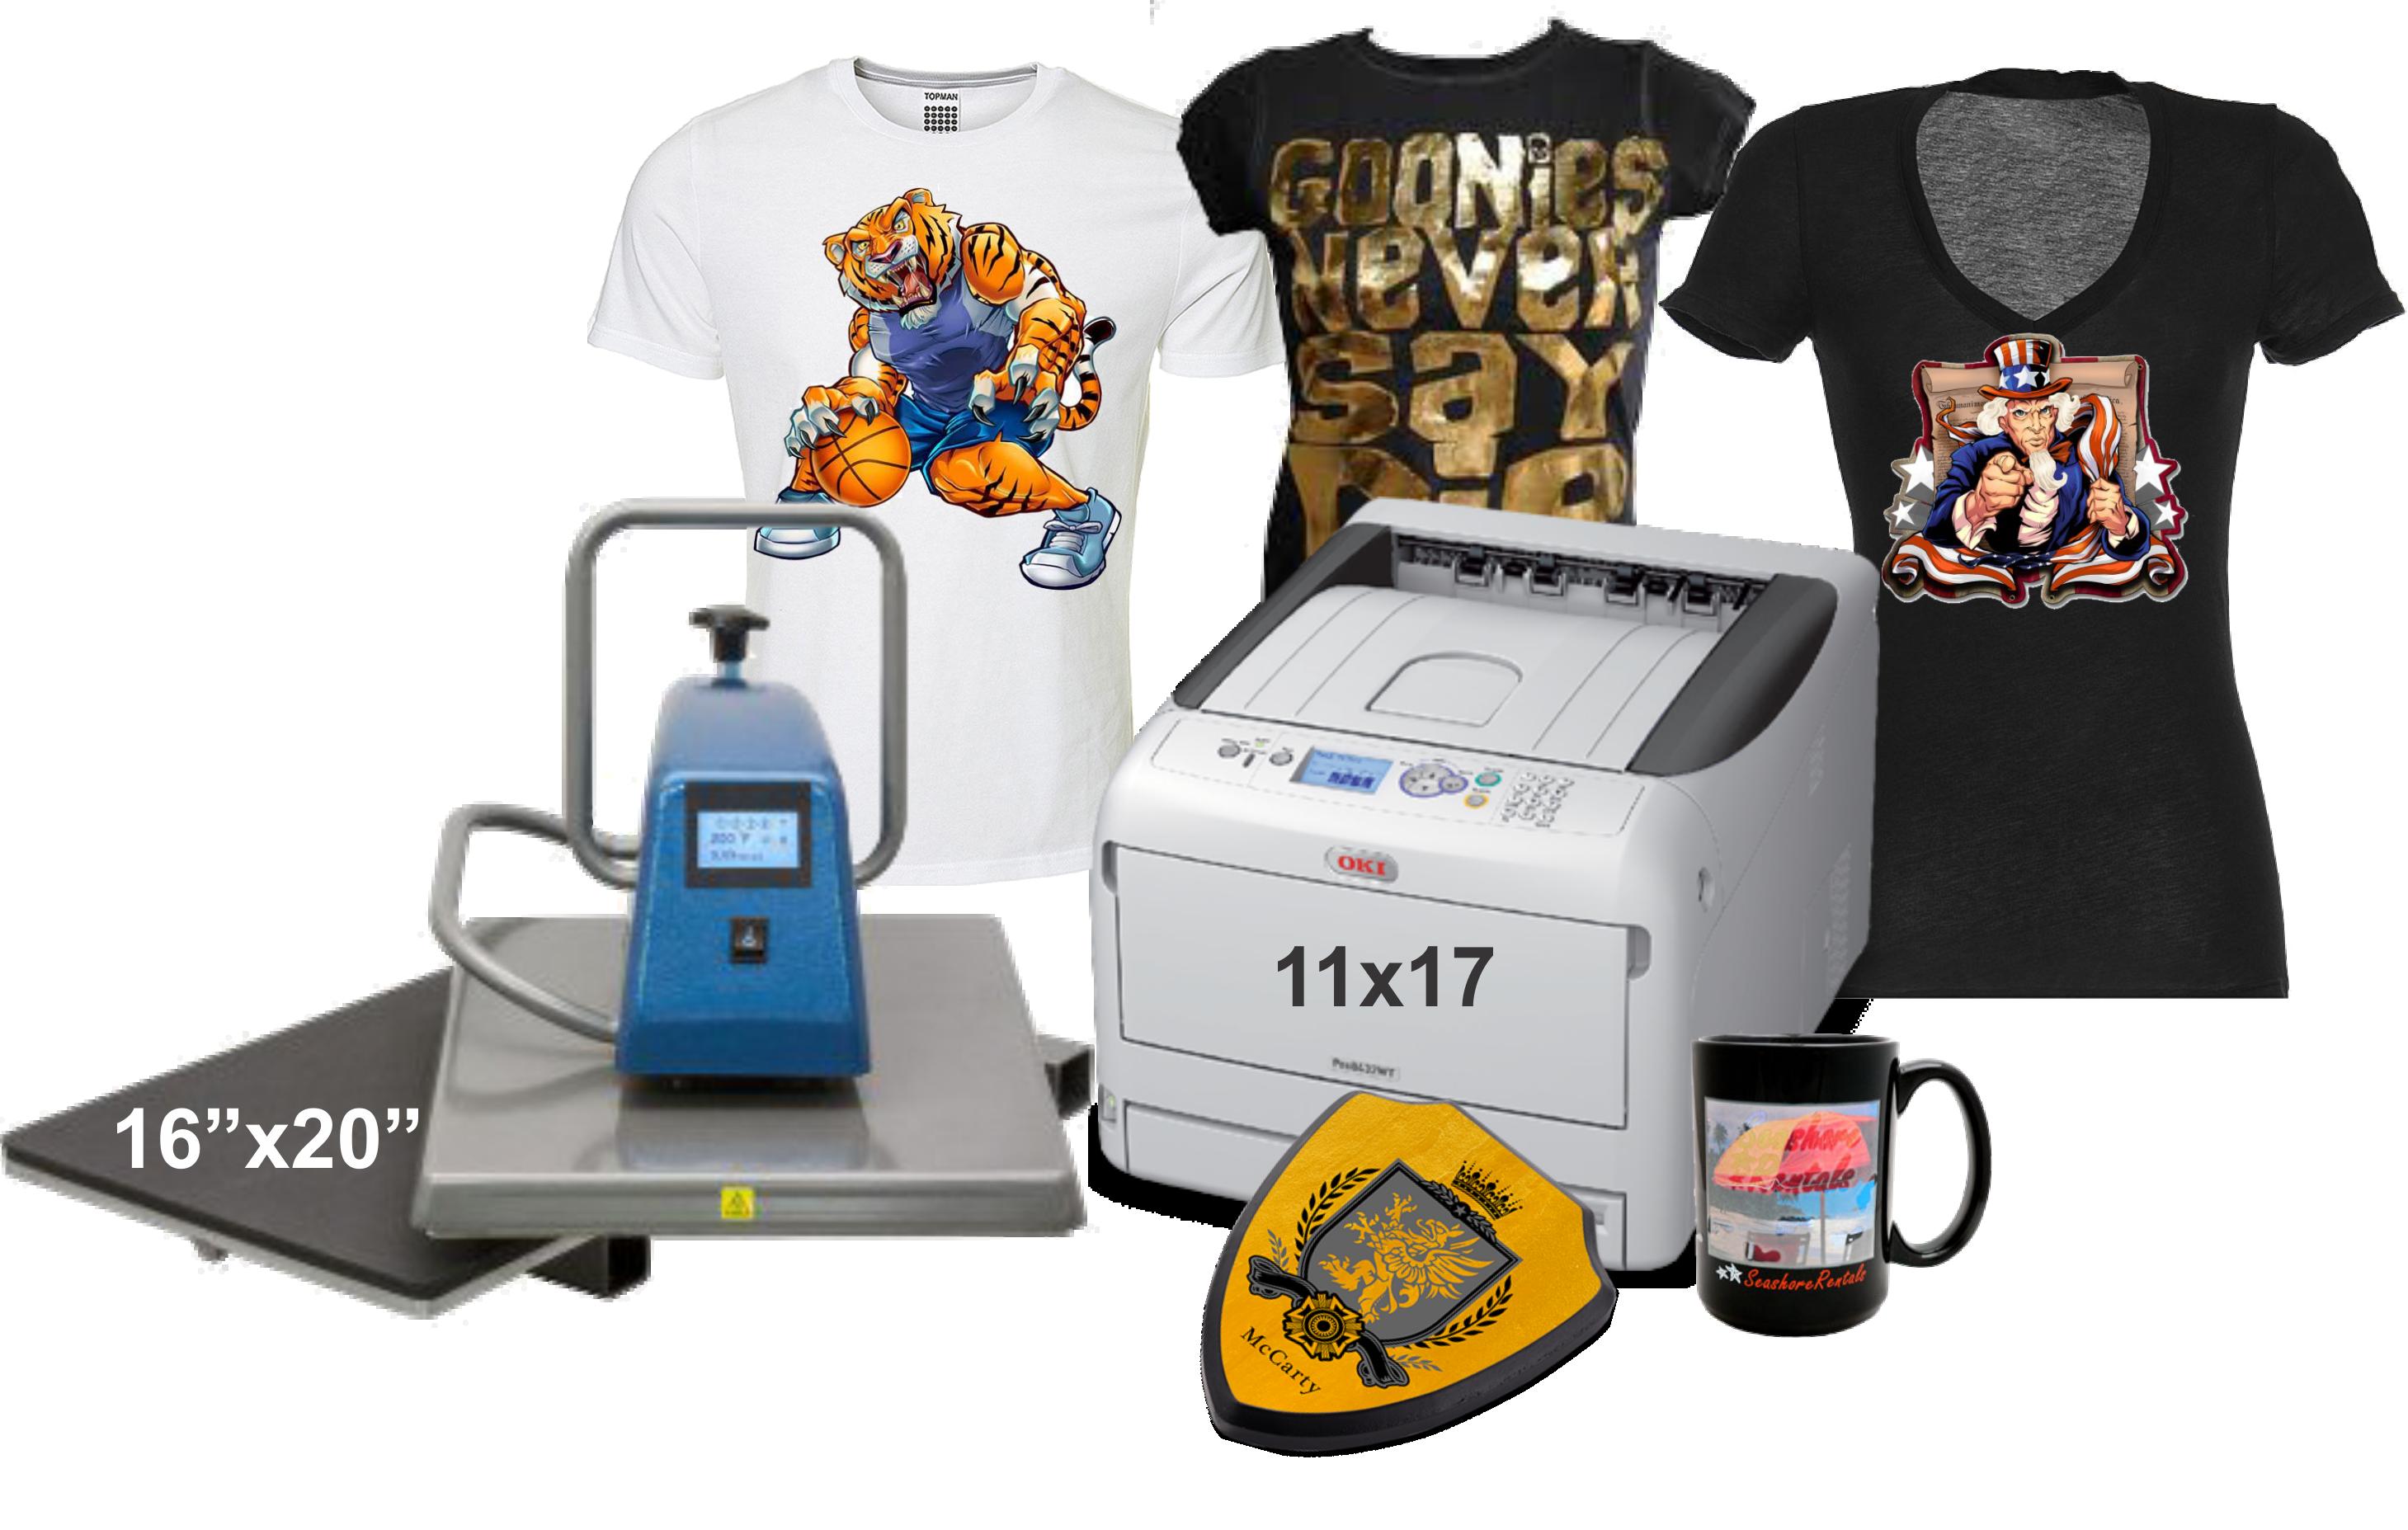 3474551f8 Epson Printers For T Shirt Transfers - DREAMWORKS